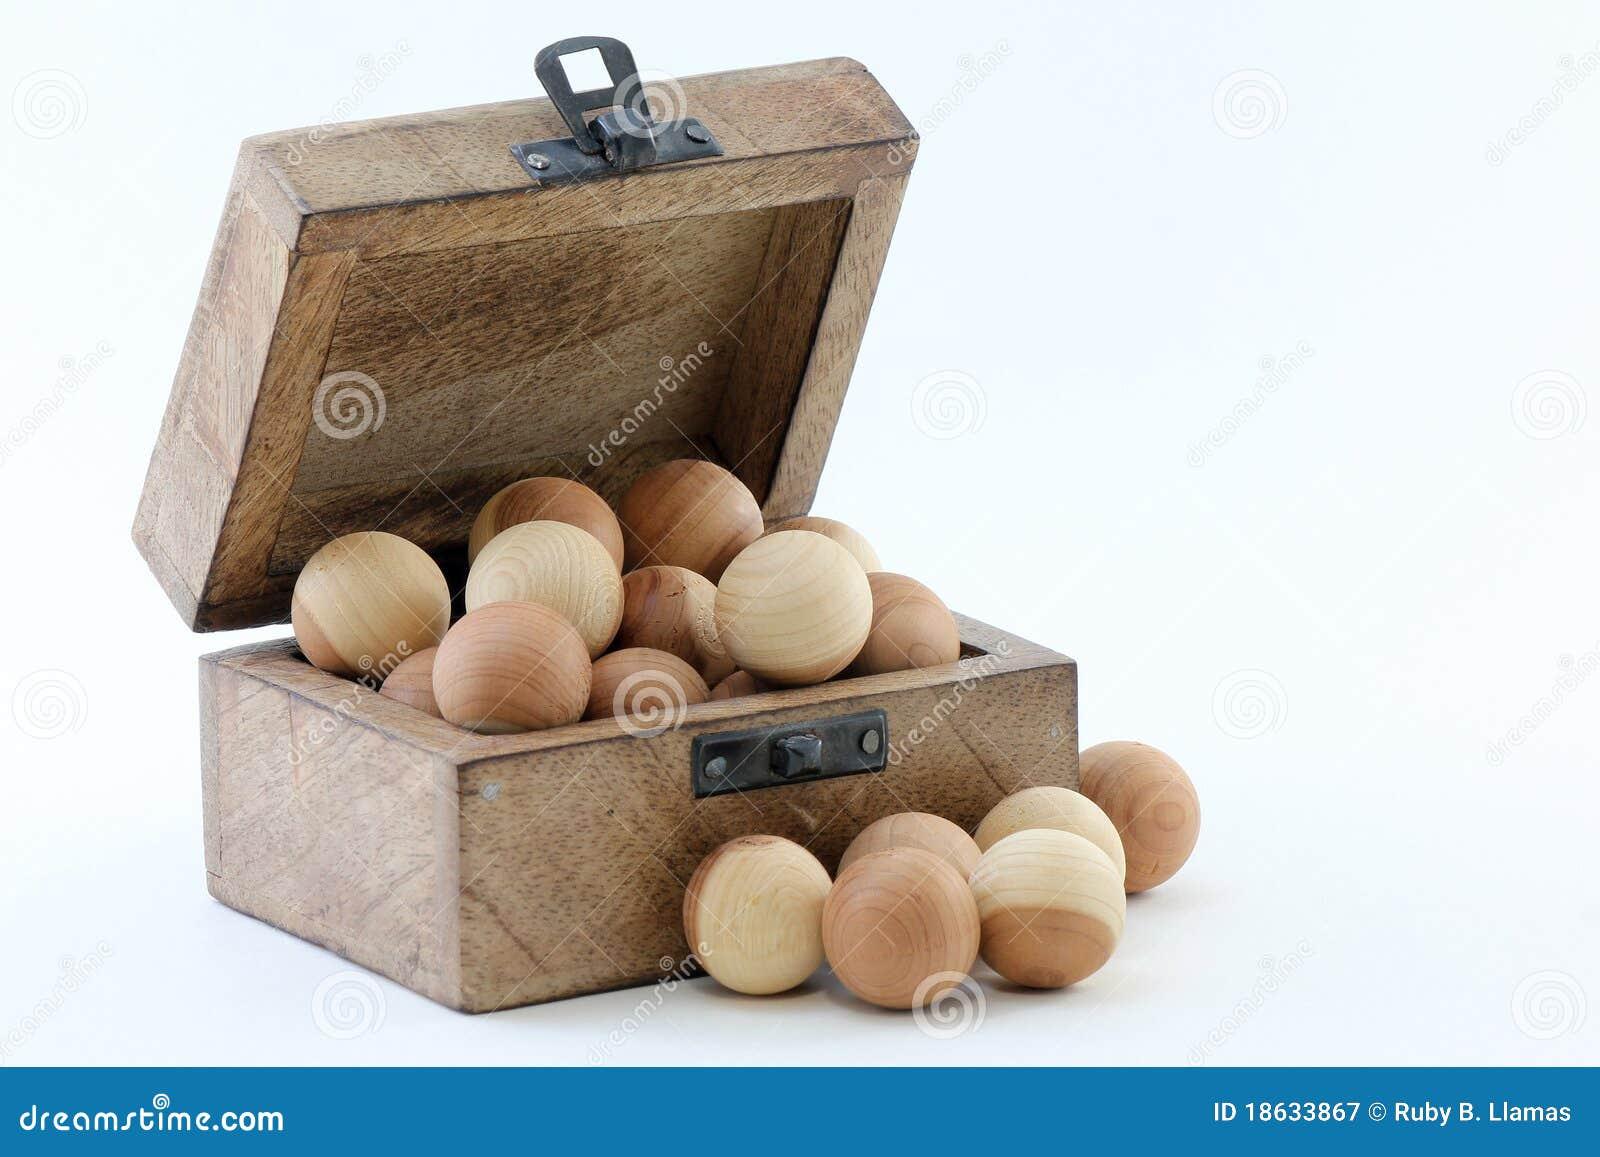 Wood Box and Cedar Balls